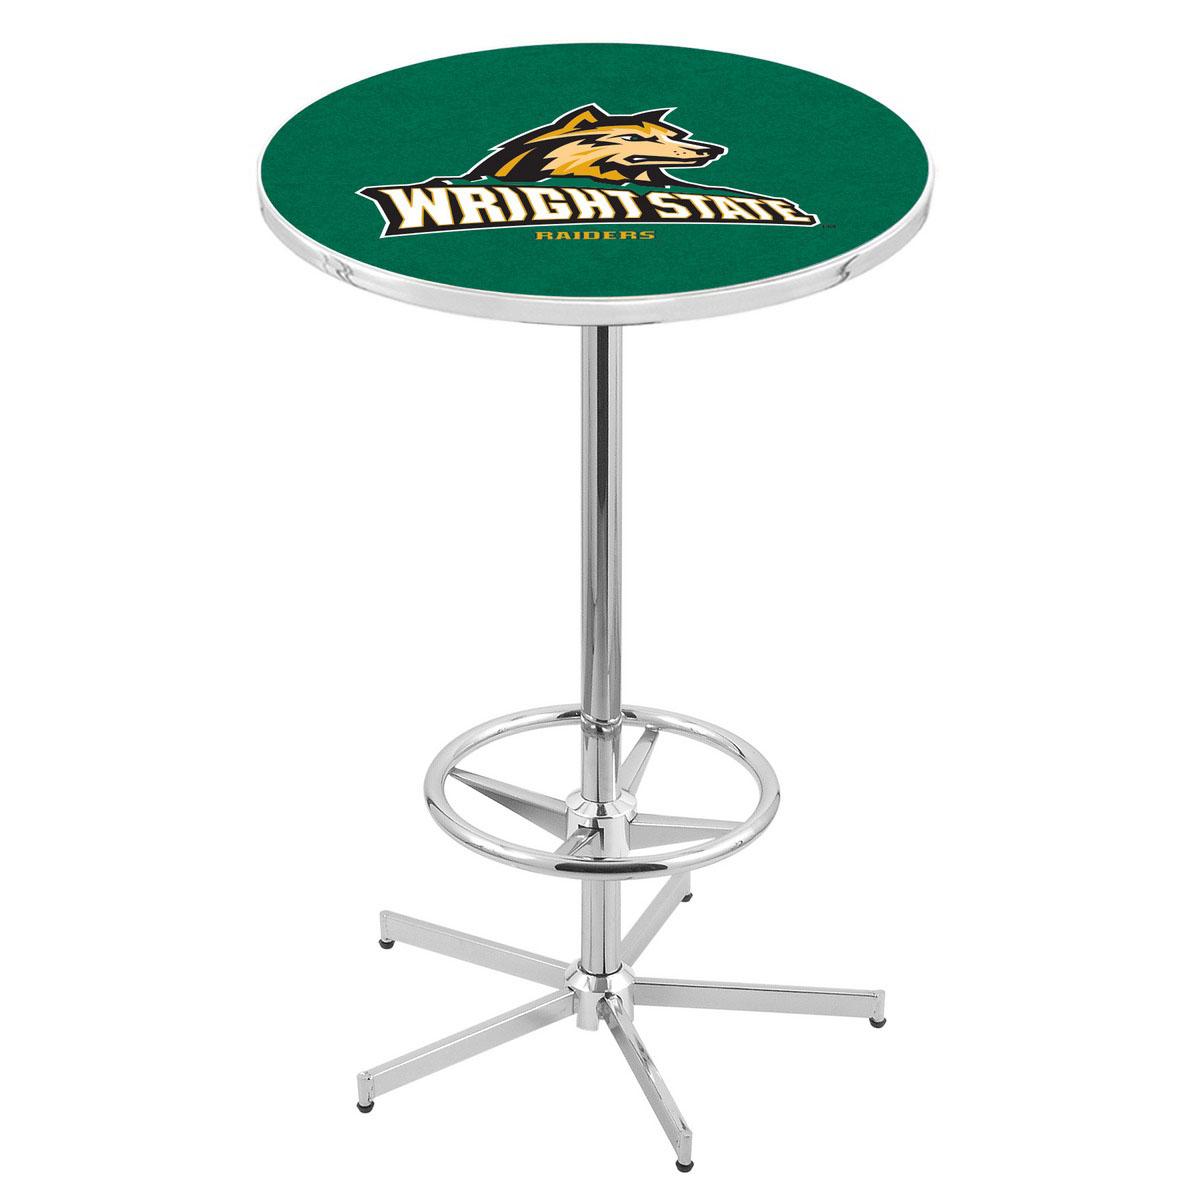 Impressive Chrome Wright State Pub Table Product Photo